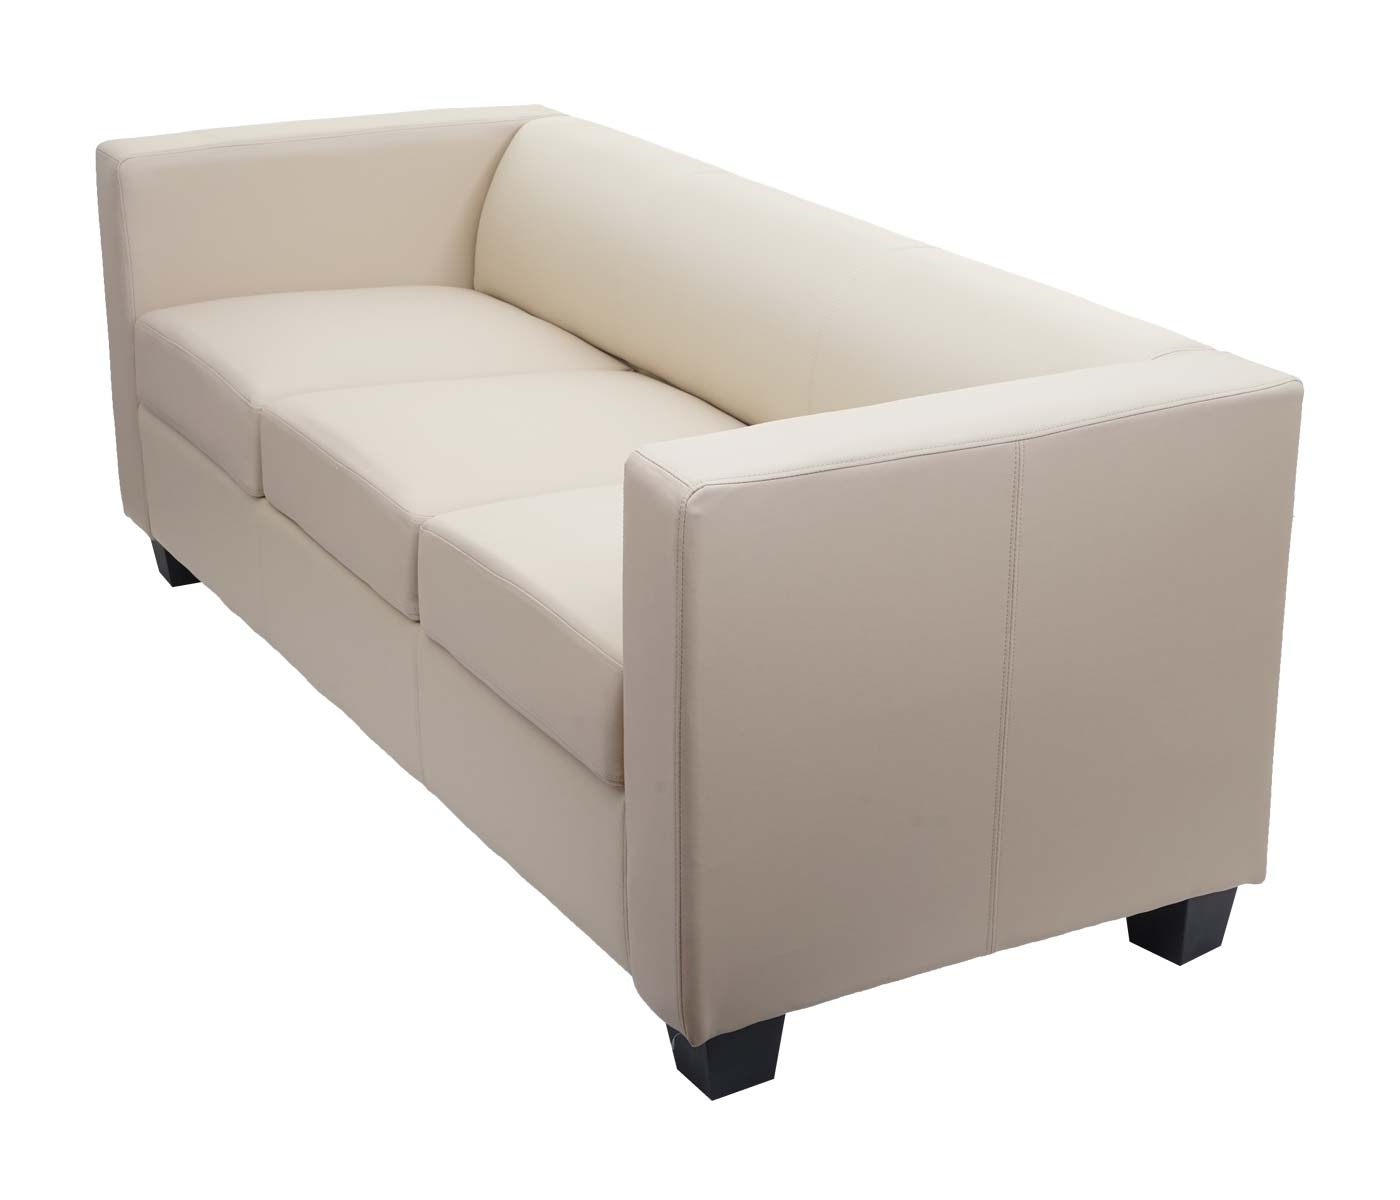 3er Sofa Couch Loungesofa Lille Seitenansicht